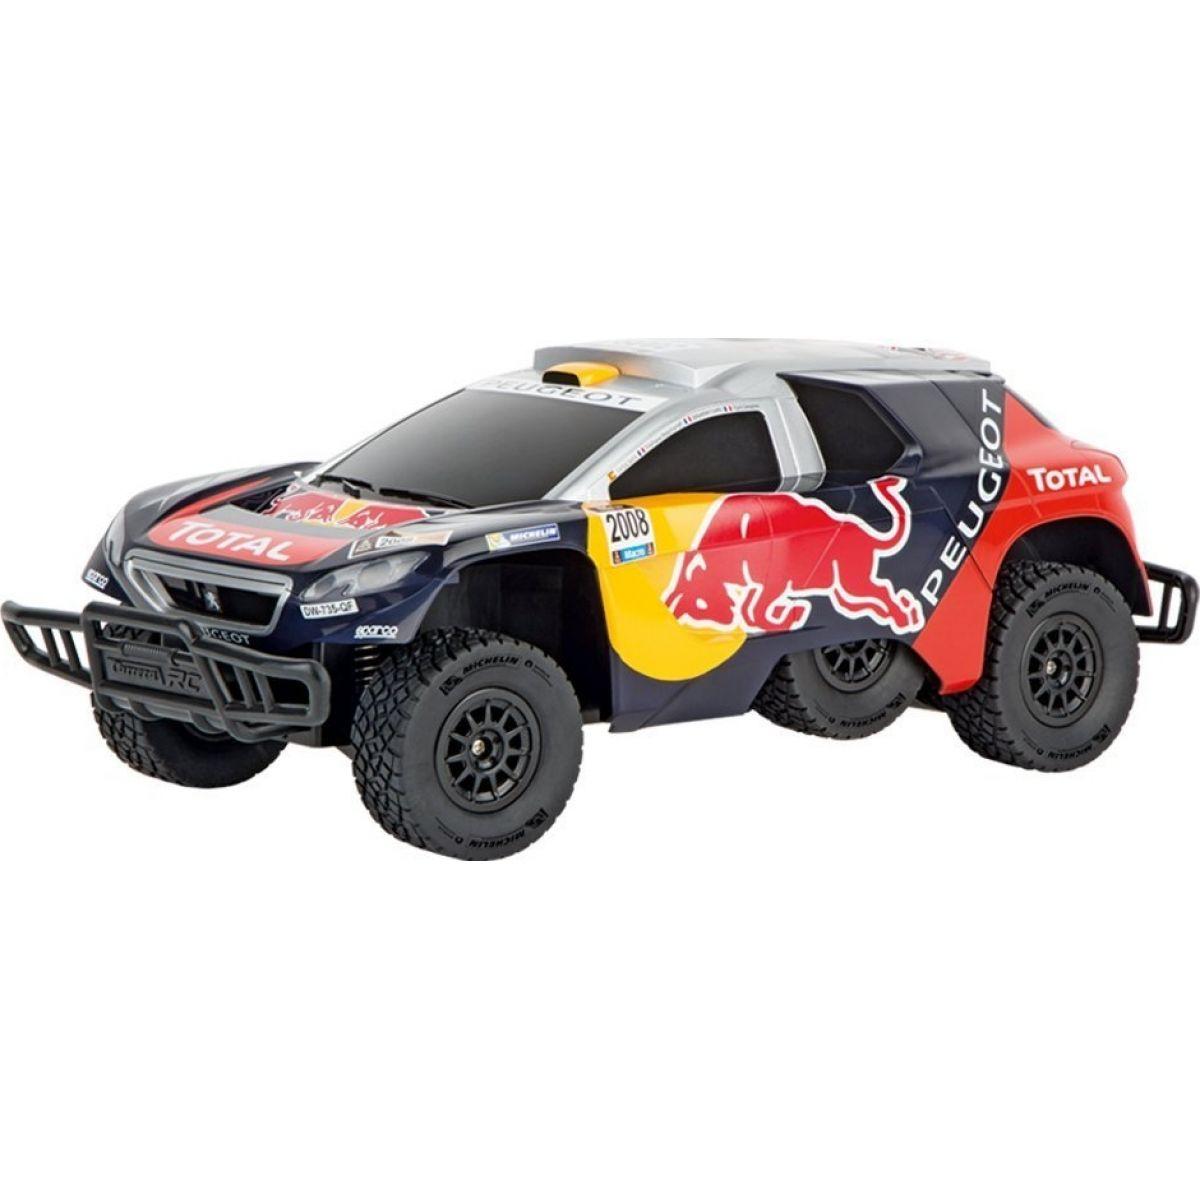 Carrera RC auto Peugeot Dakar 1:16